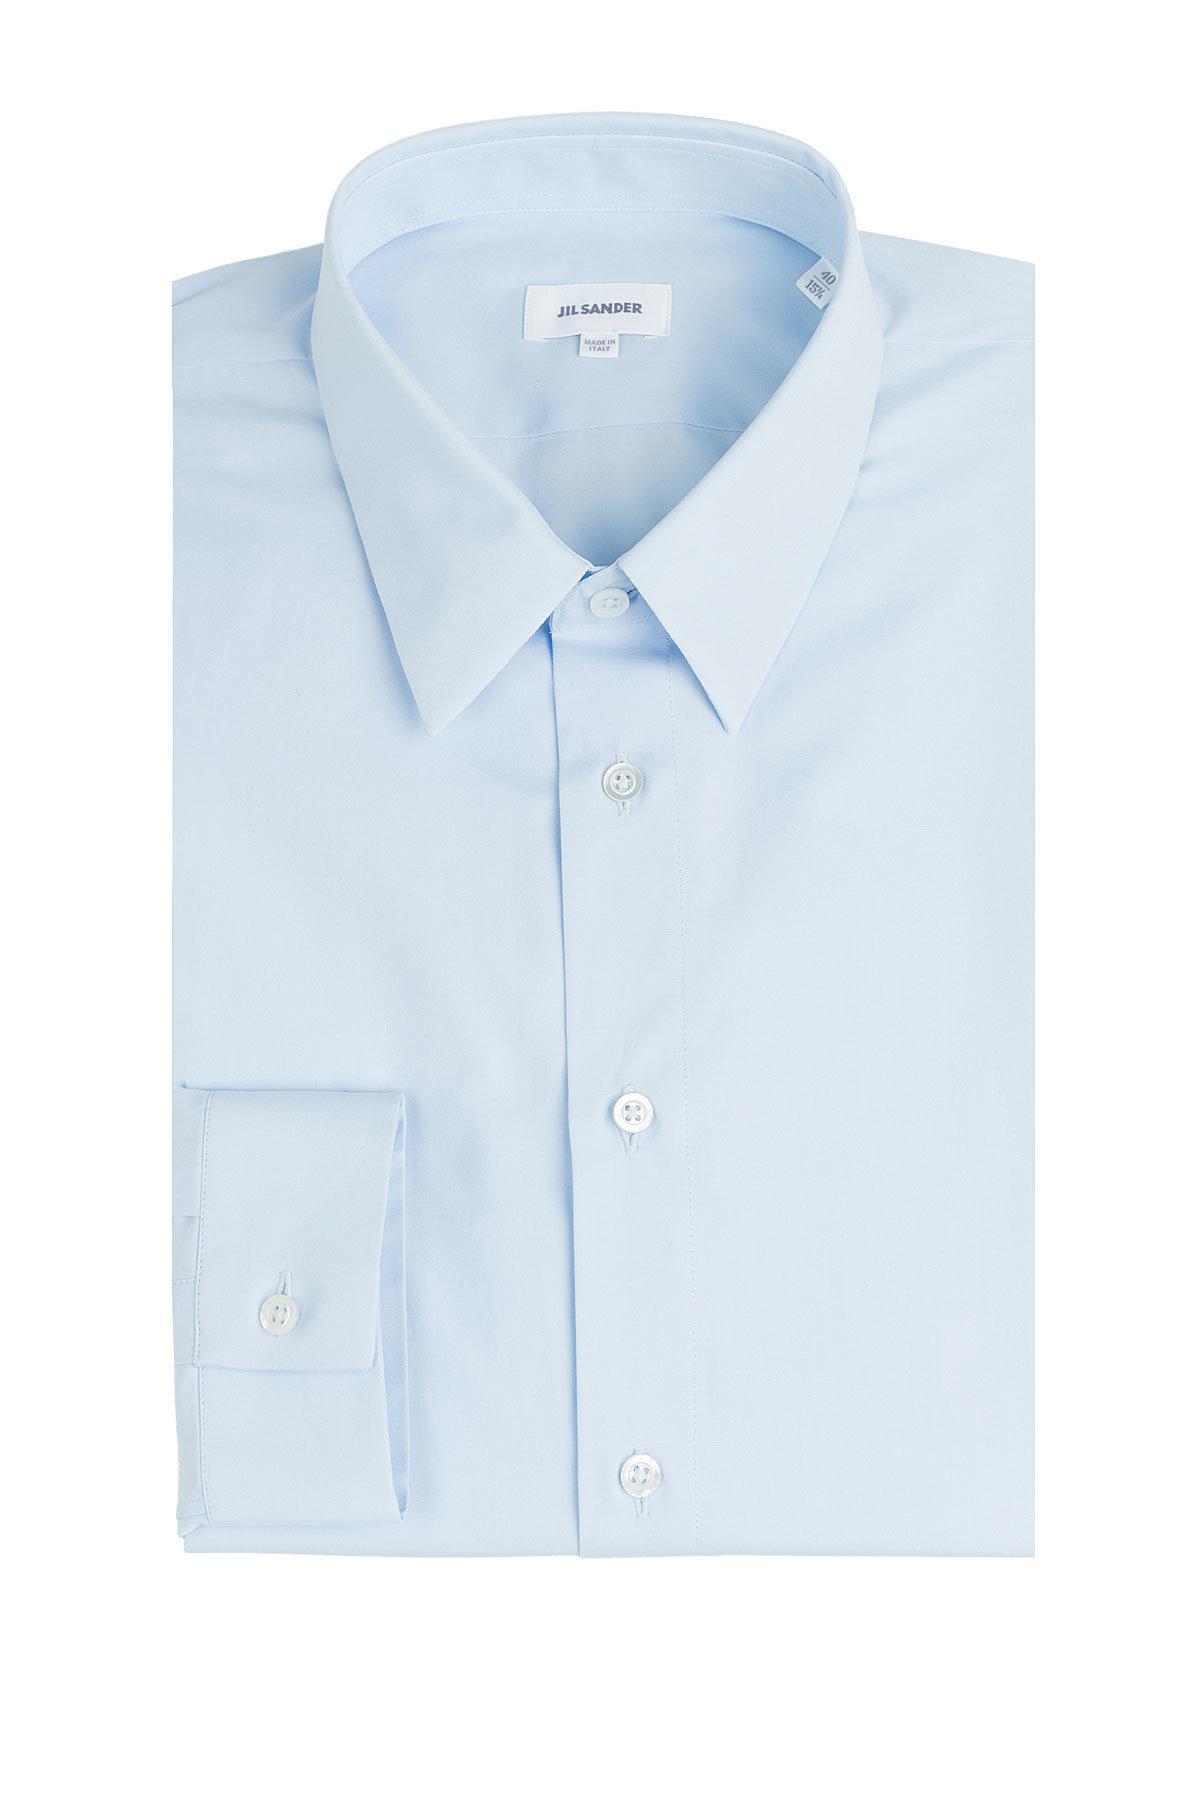 Jil sander cotton shirt in blue for men lyst for Jil sander mens shirt